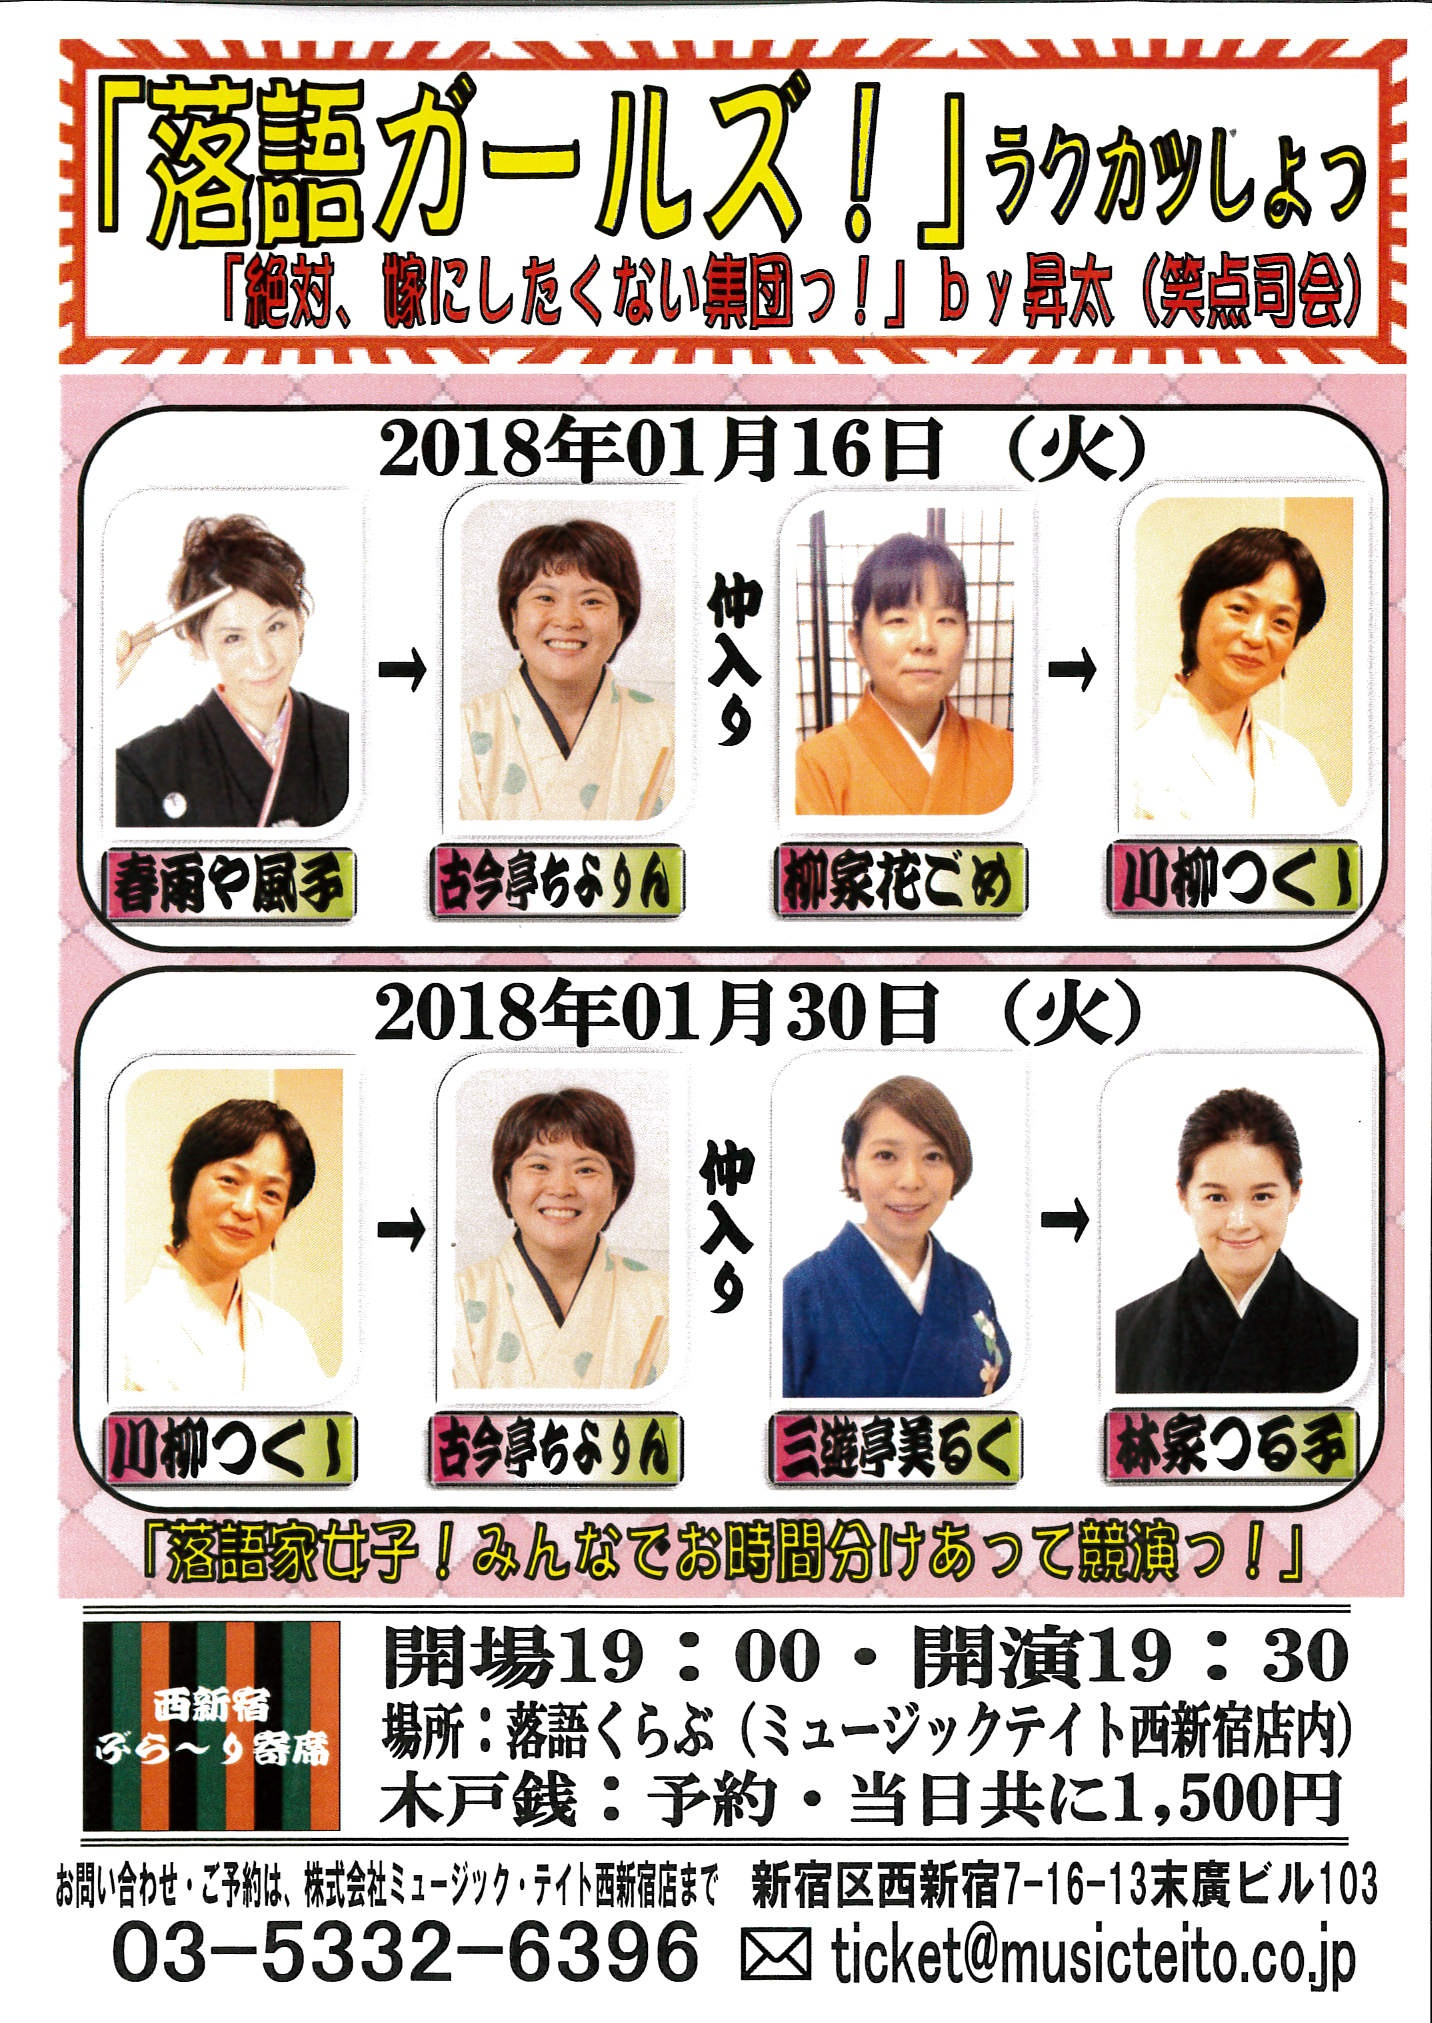 rakugo116_2018-01-06-22-44-47.jpg